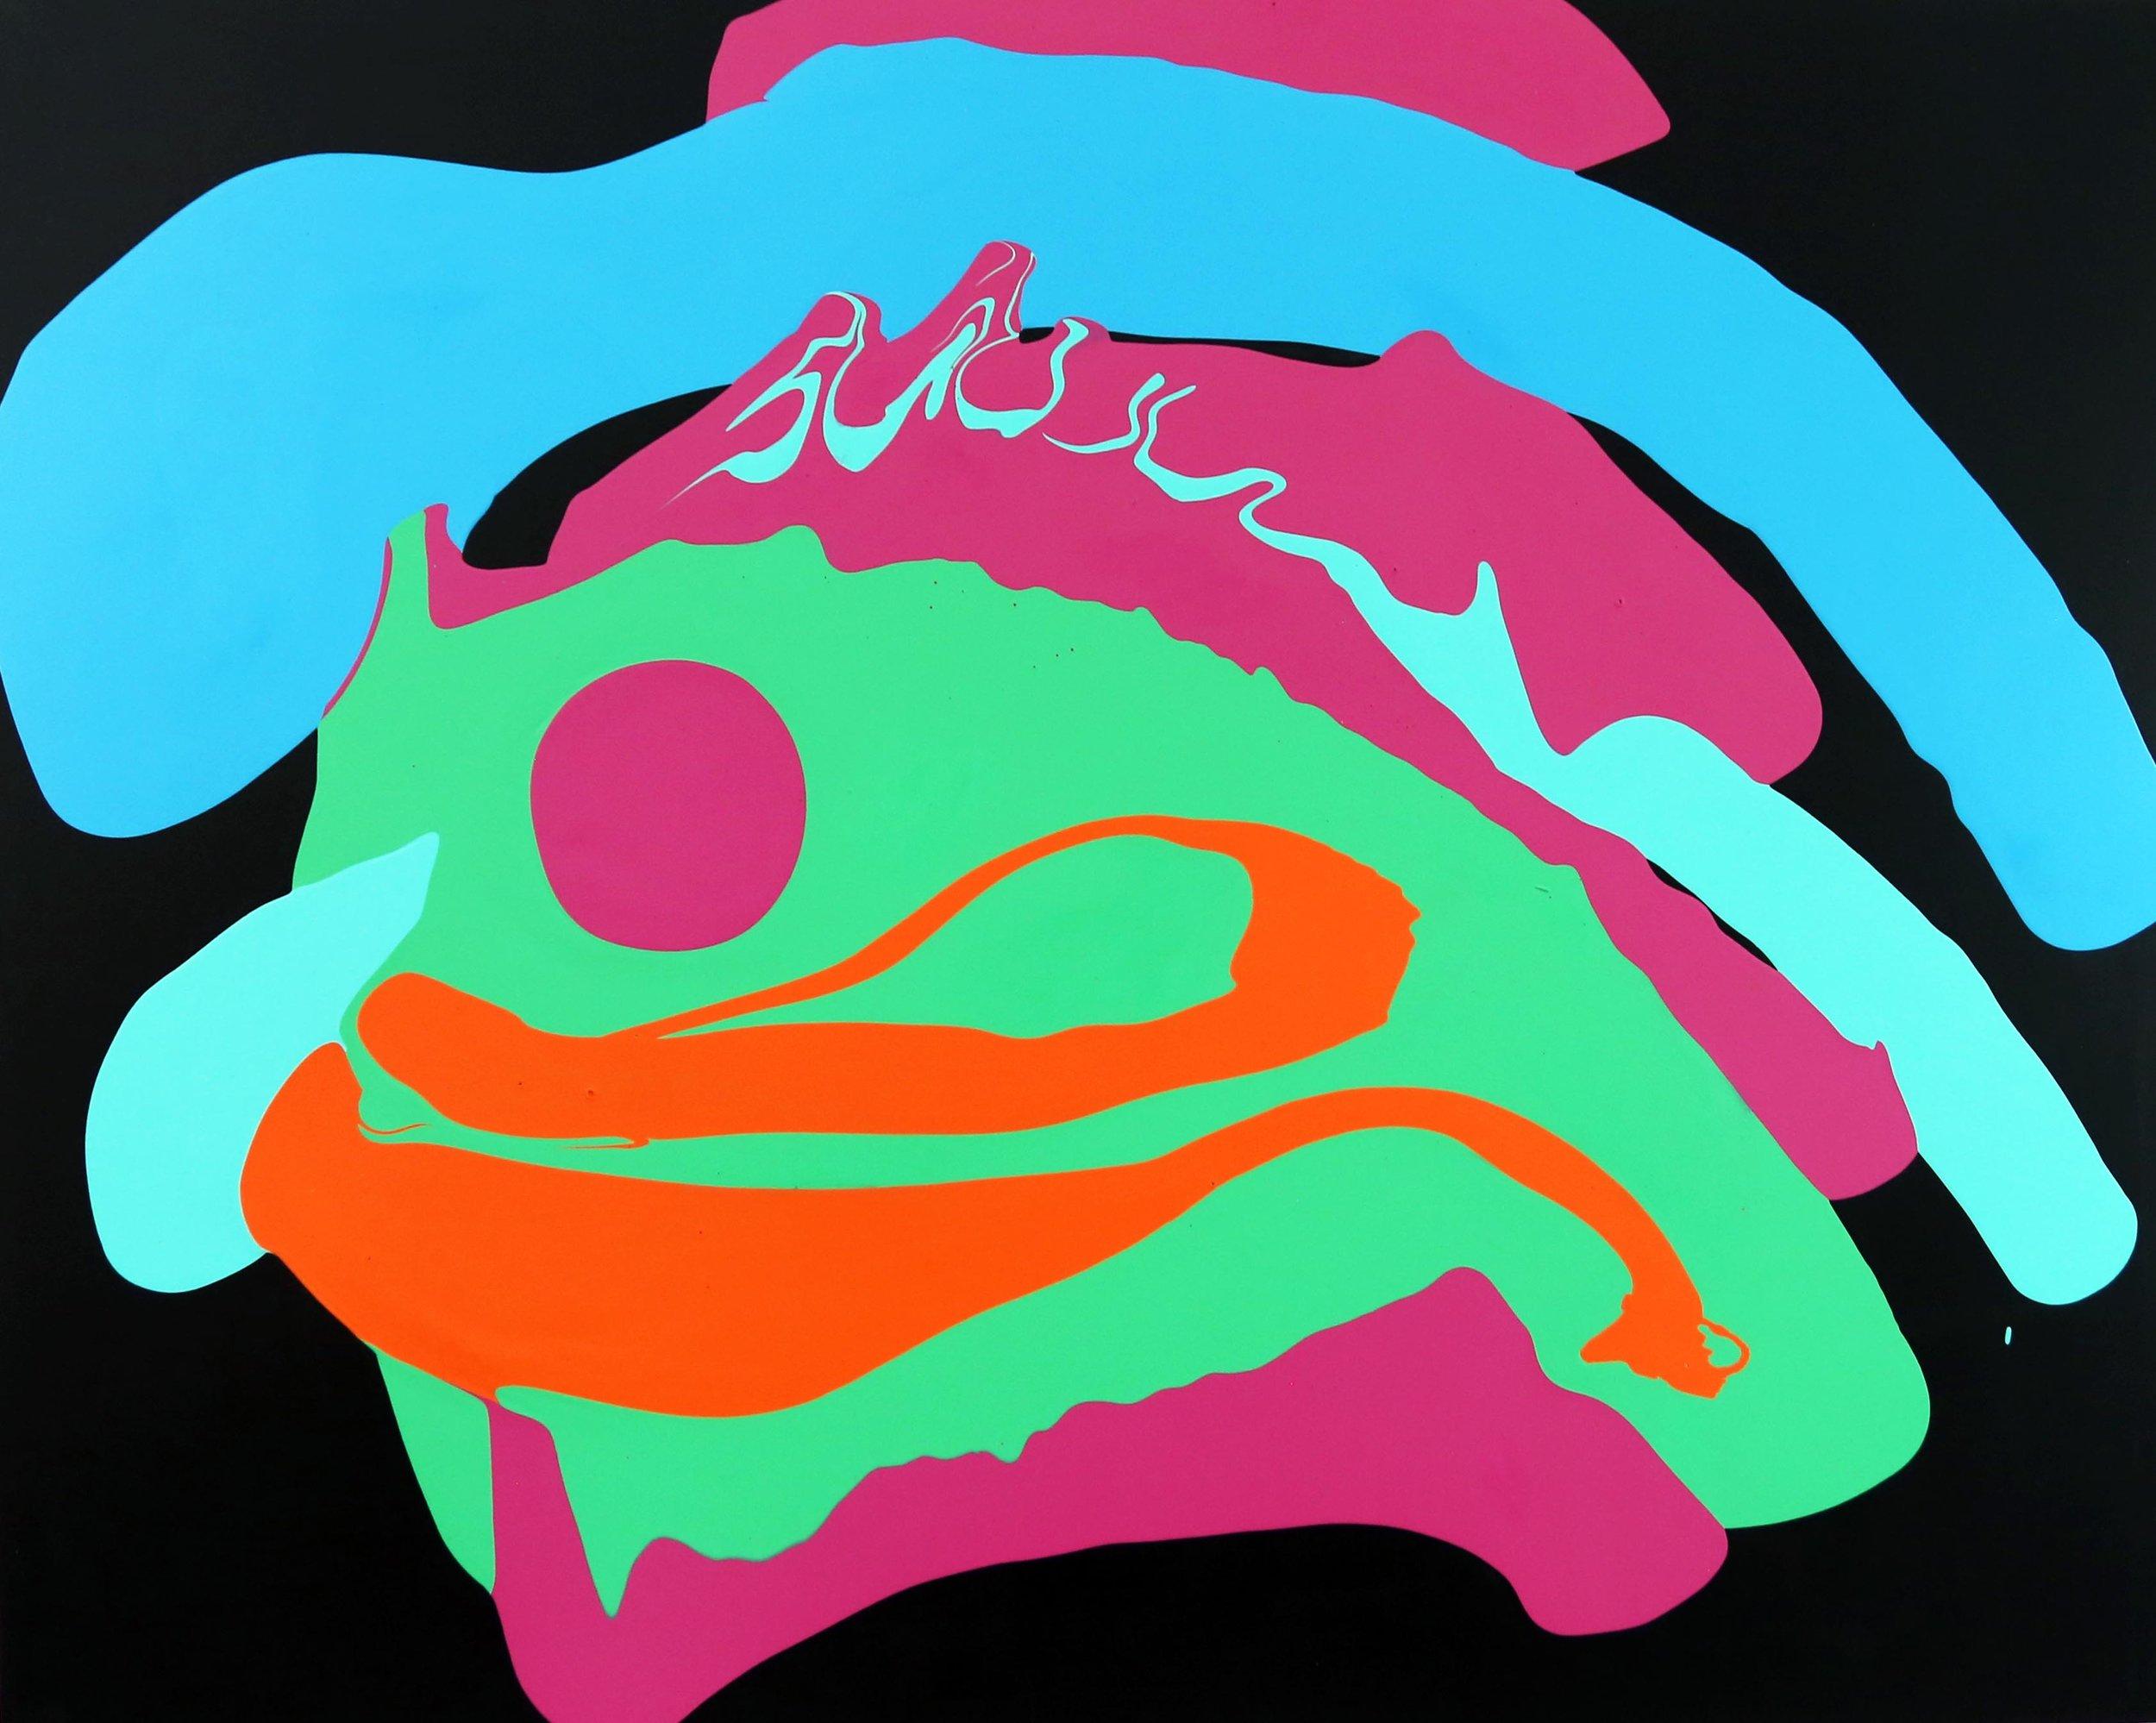 Jenny_Sharaf-The_California_Girl_Goes_To_Dubai-101x127cm-Paint_On_Pleather.jpg